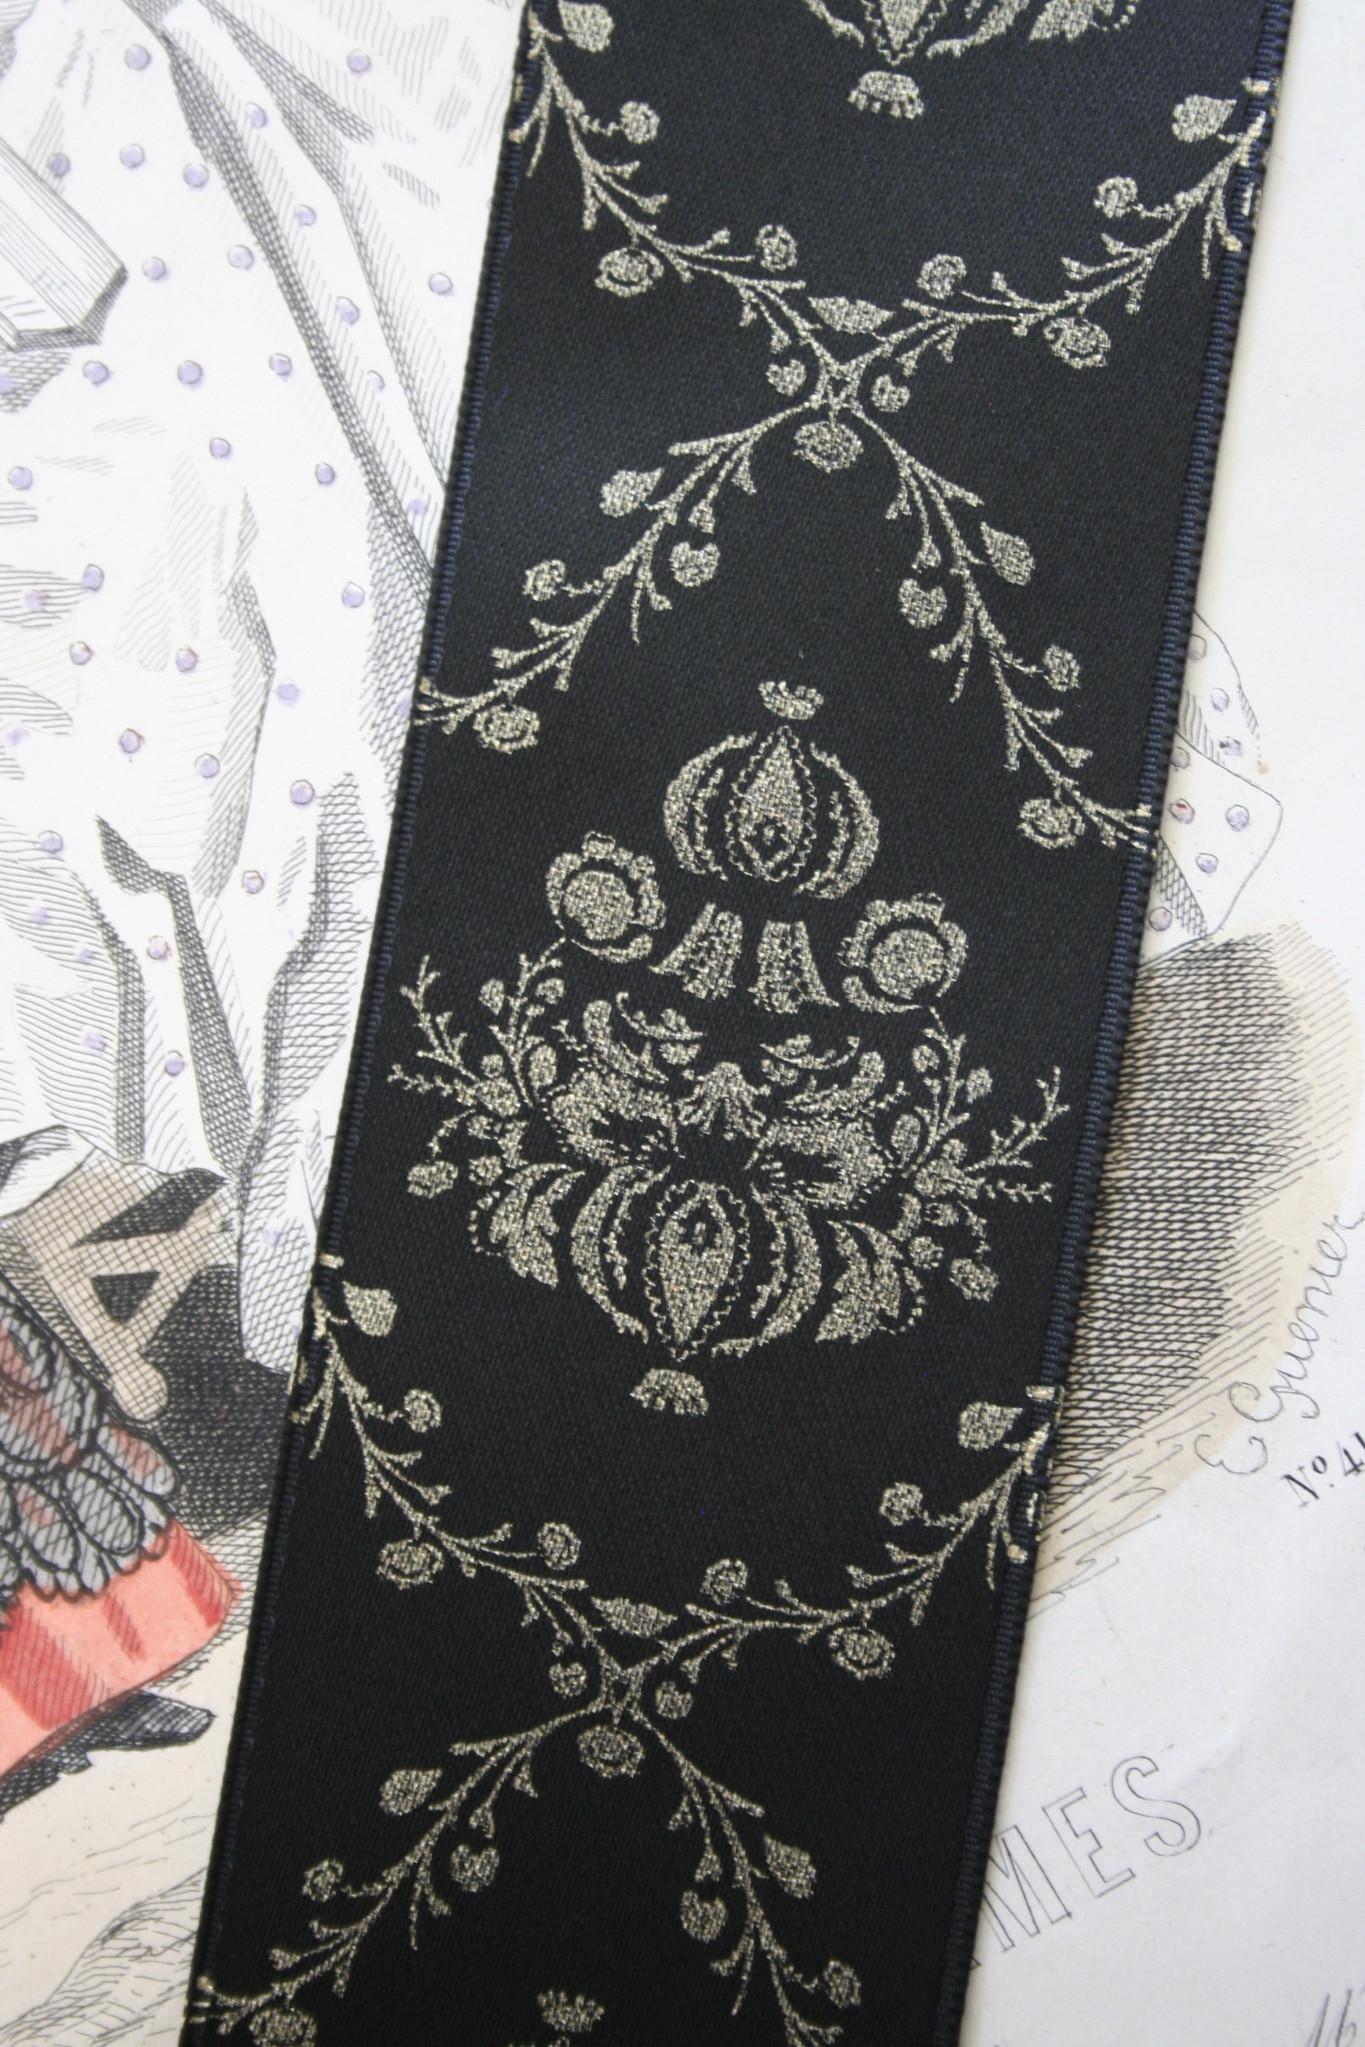 Black satin ribbon with gold Baroque print 40mm.